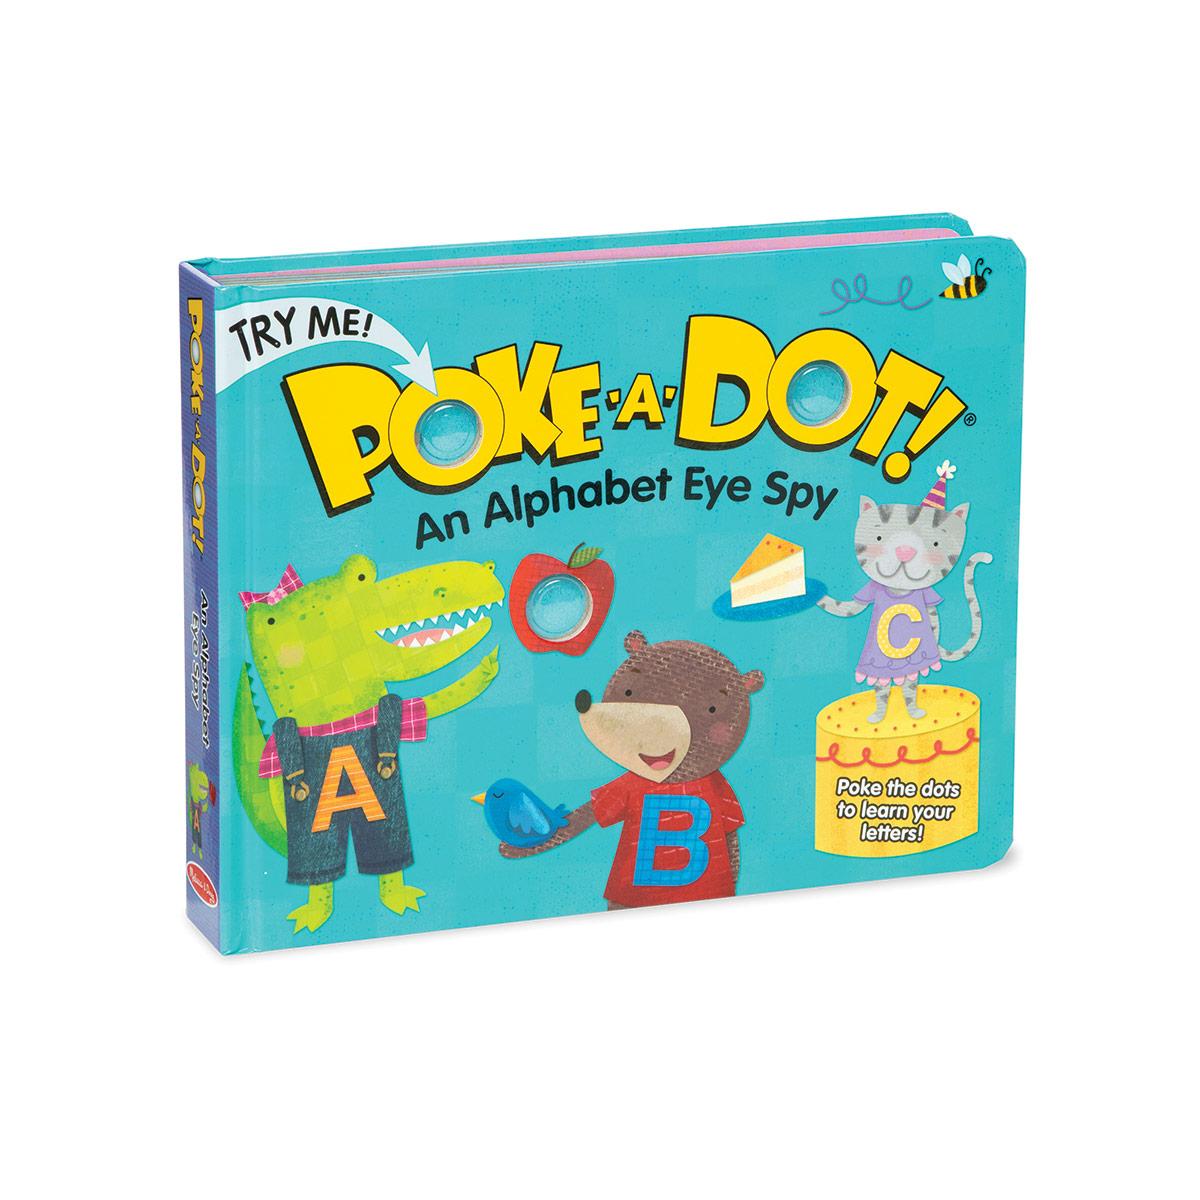 Poke-A-Dot - Alphabet Eye Spy